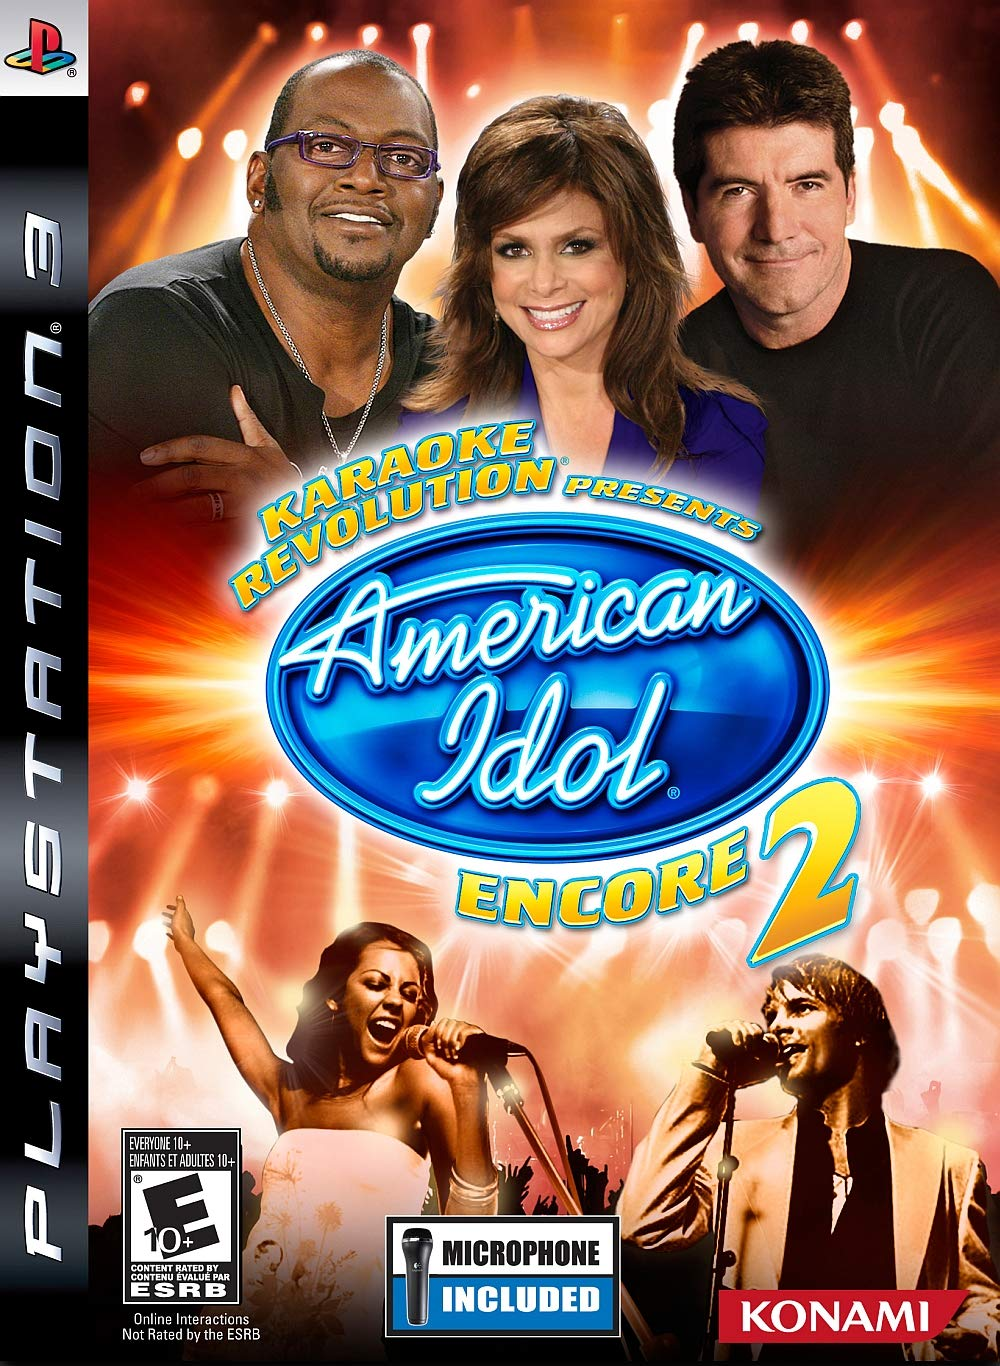 Amazon Com Karaoke Revolution Presents American Idol Encore 2 Game Only Video Games